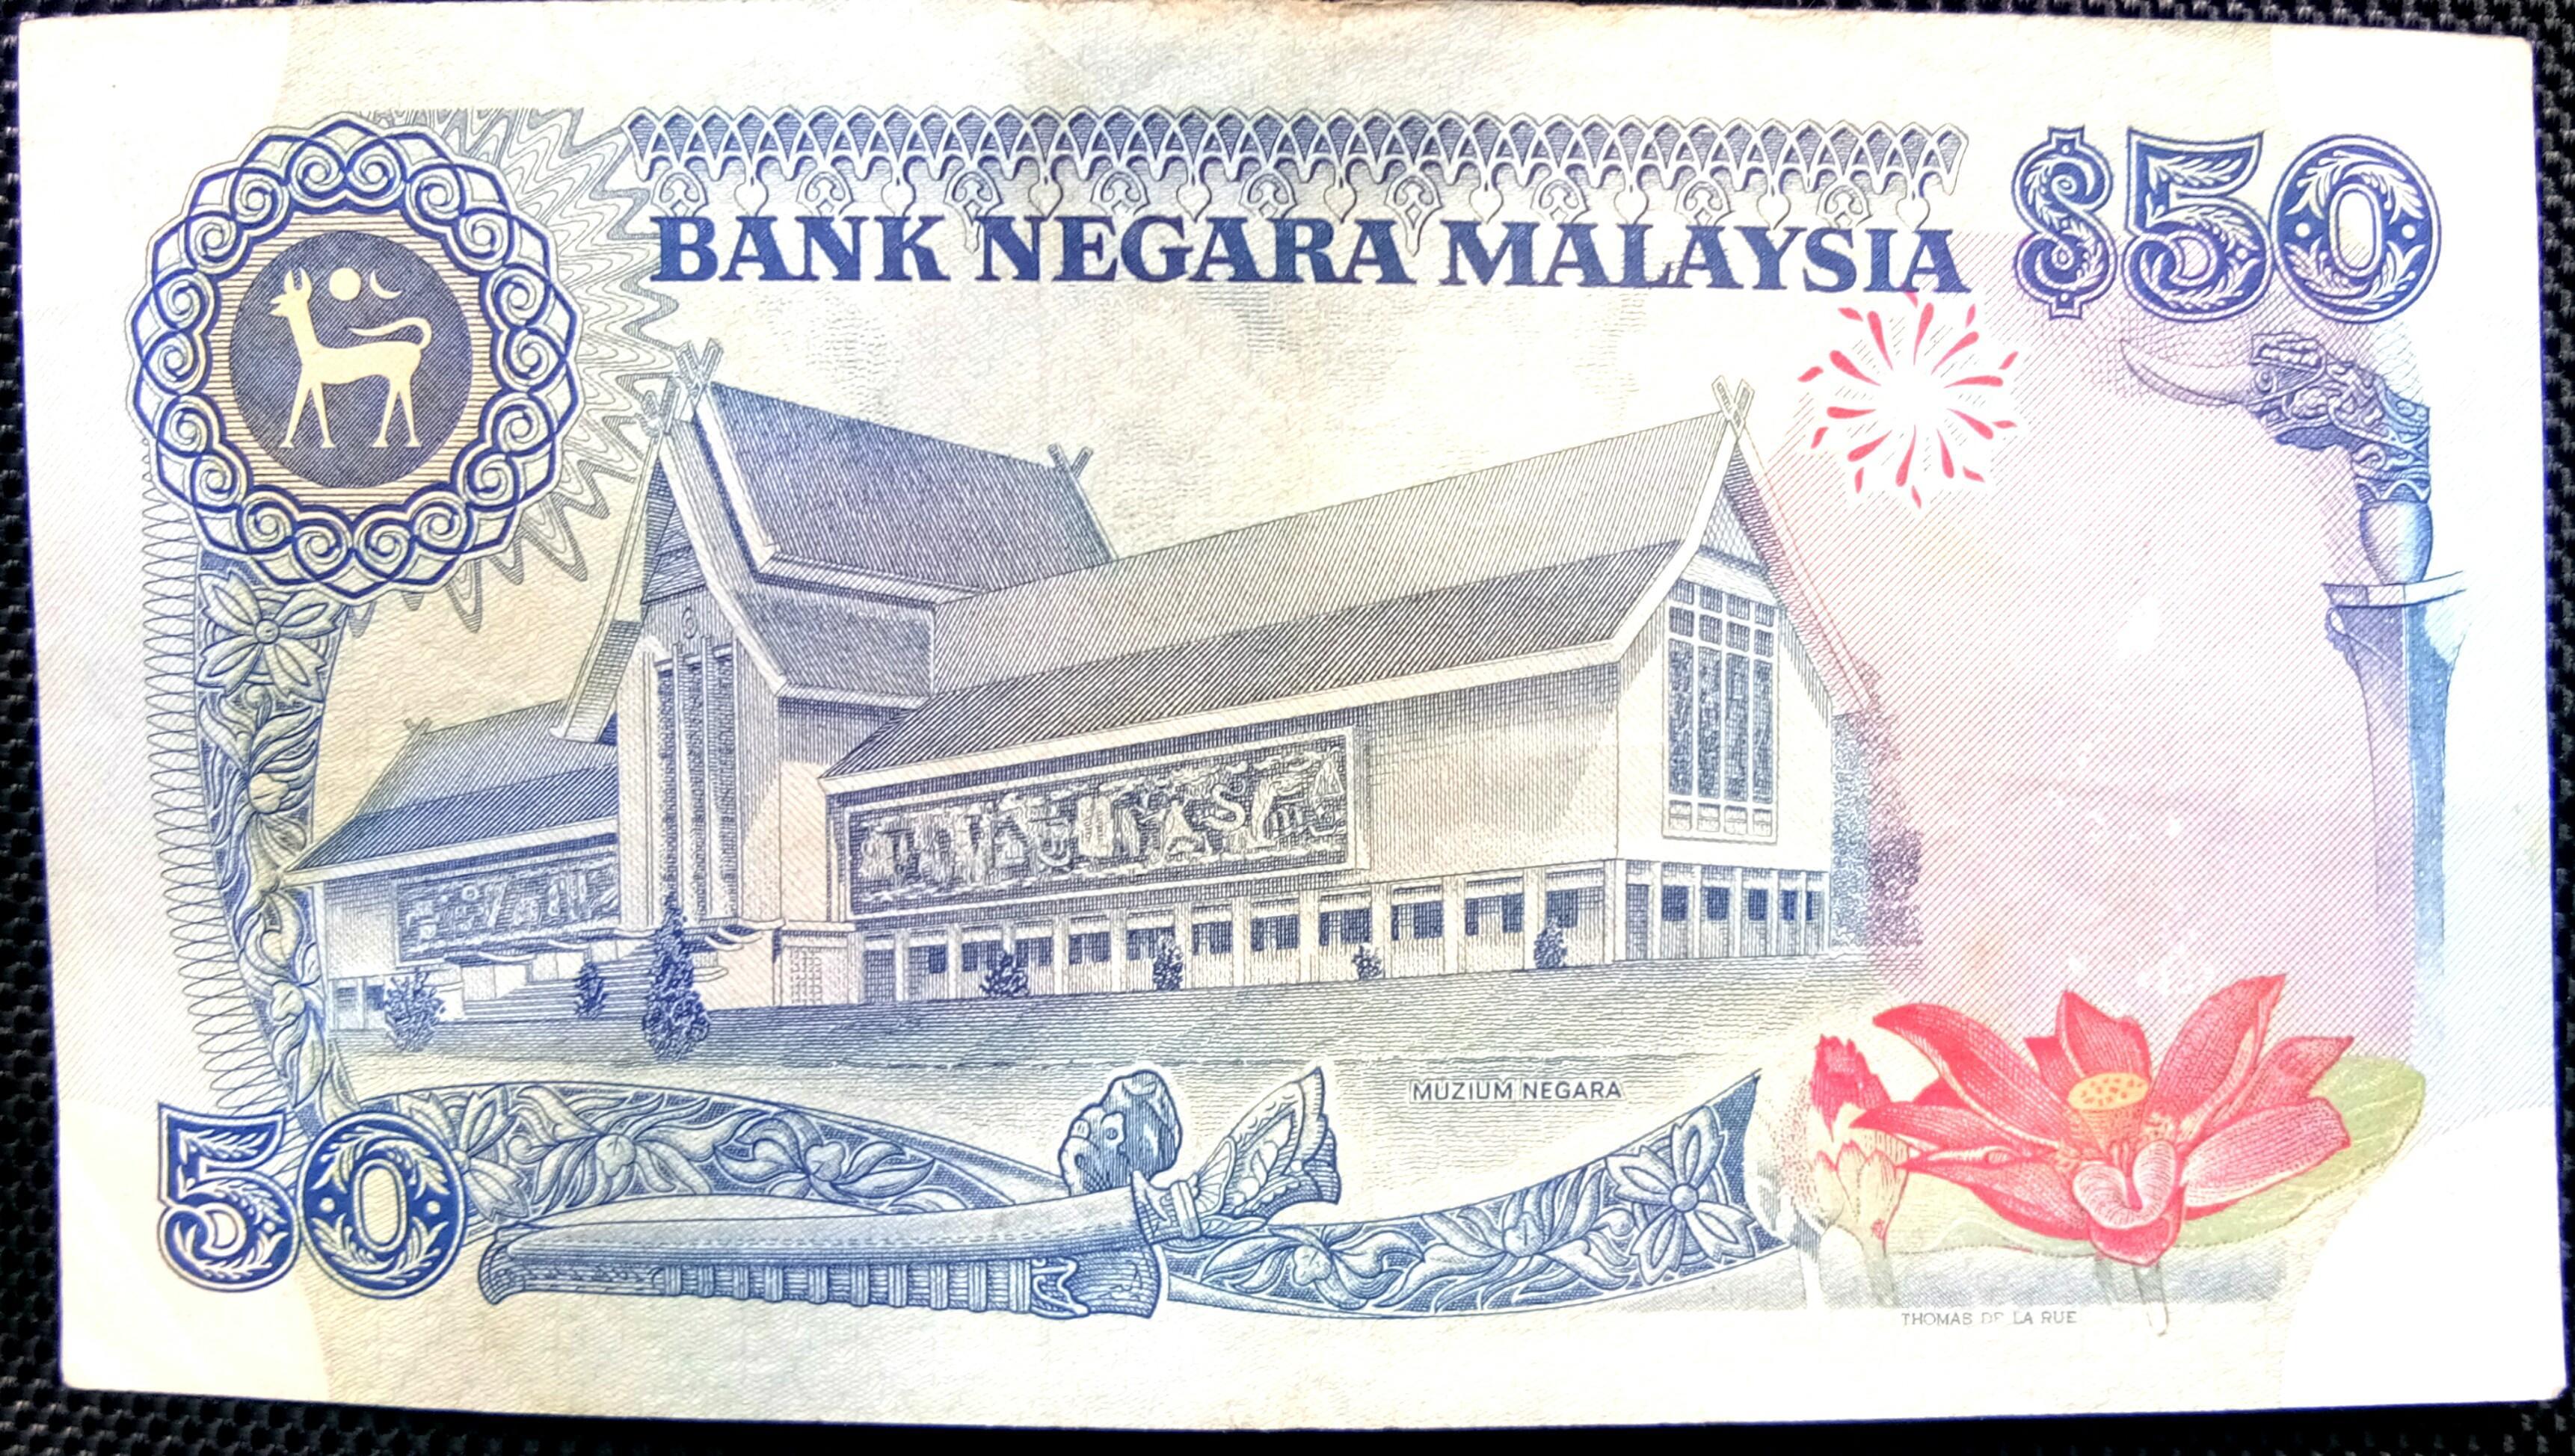 VM 22 3333 2 RM50 Old Banknote Tan Sri Abdul Aziz bin Haji Taha Gabenor ke 3, 5 Tahun Julai 1980 Jun 1985, Wang Kertas Lama 50 ringgit number 2233332